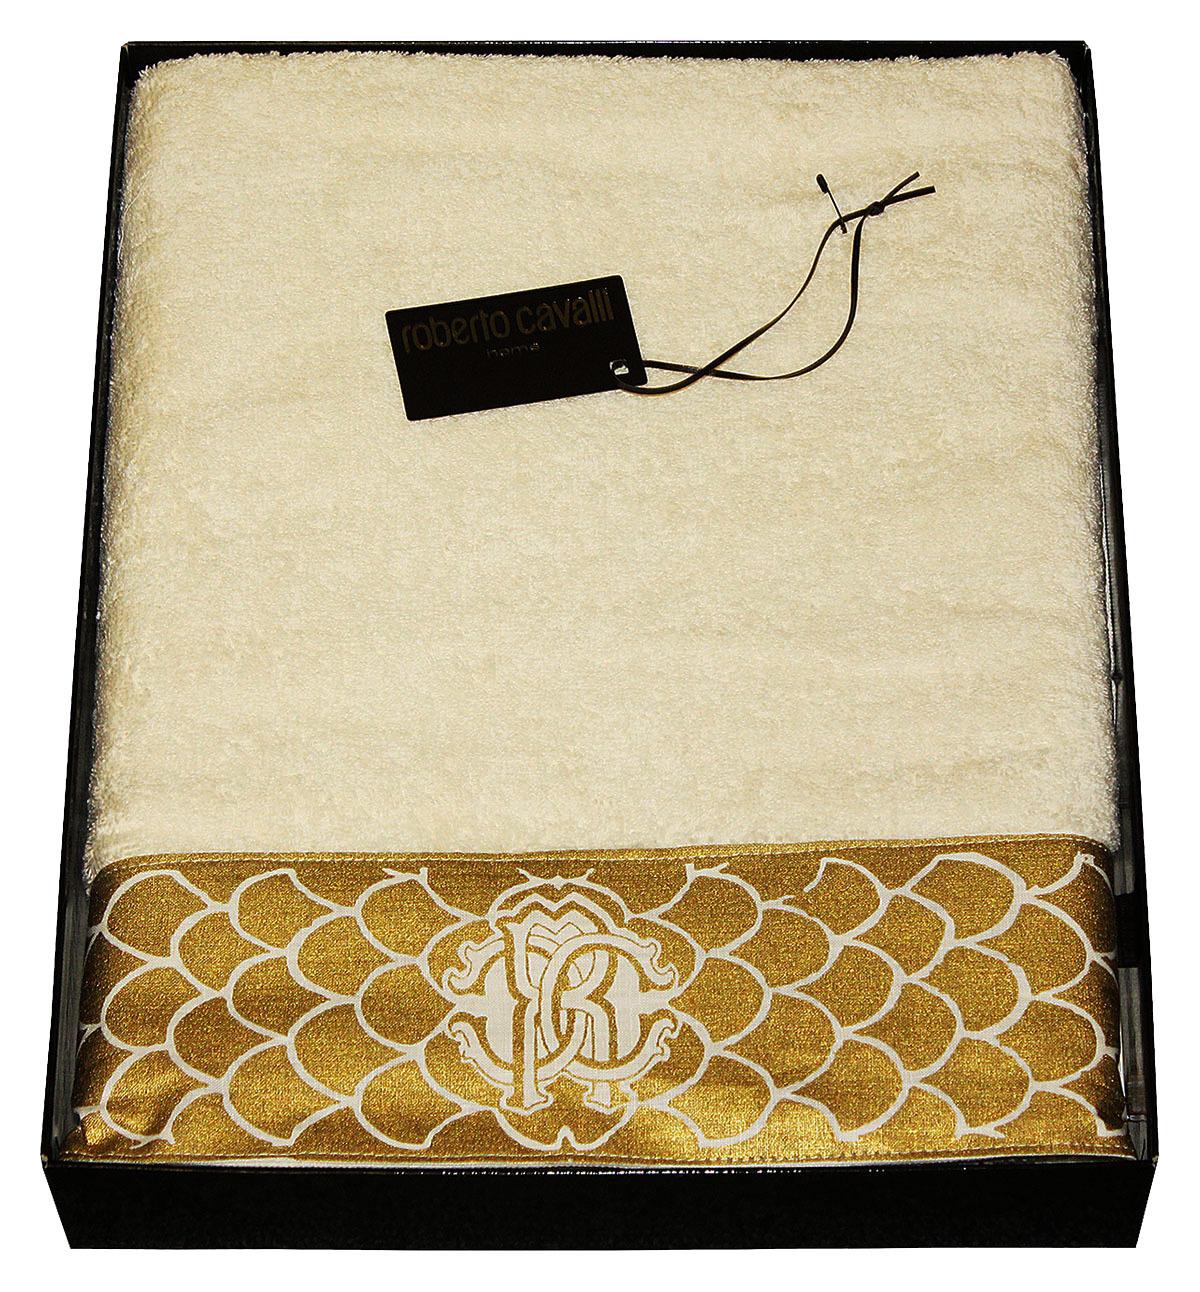 Полотенца Полотенце 100х150 Roberto Cavalli Gold слоновой кости elitnye-polotentsa-mahrovye-gold-slonovaya-kost-ot-roberto-cavalli-italiya.jpg